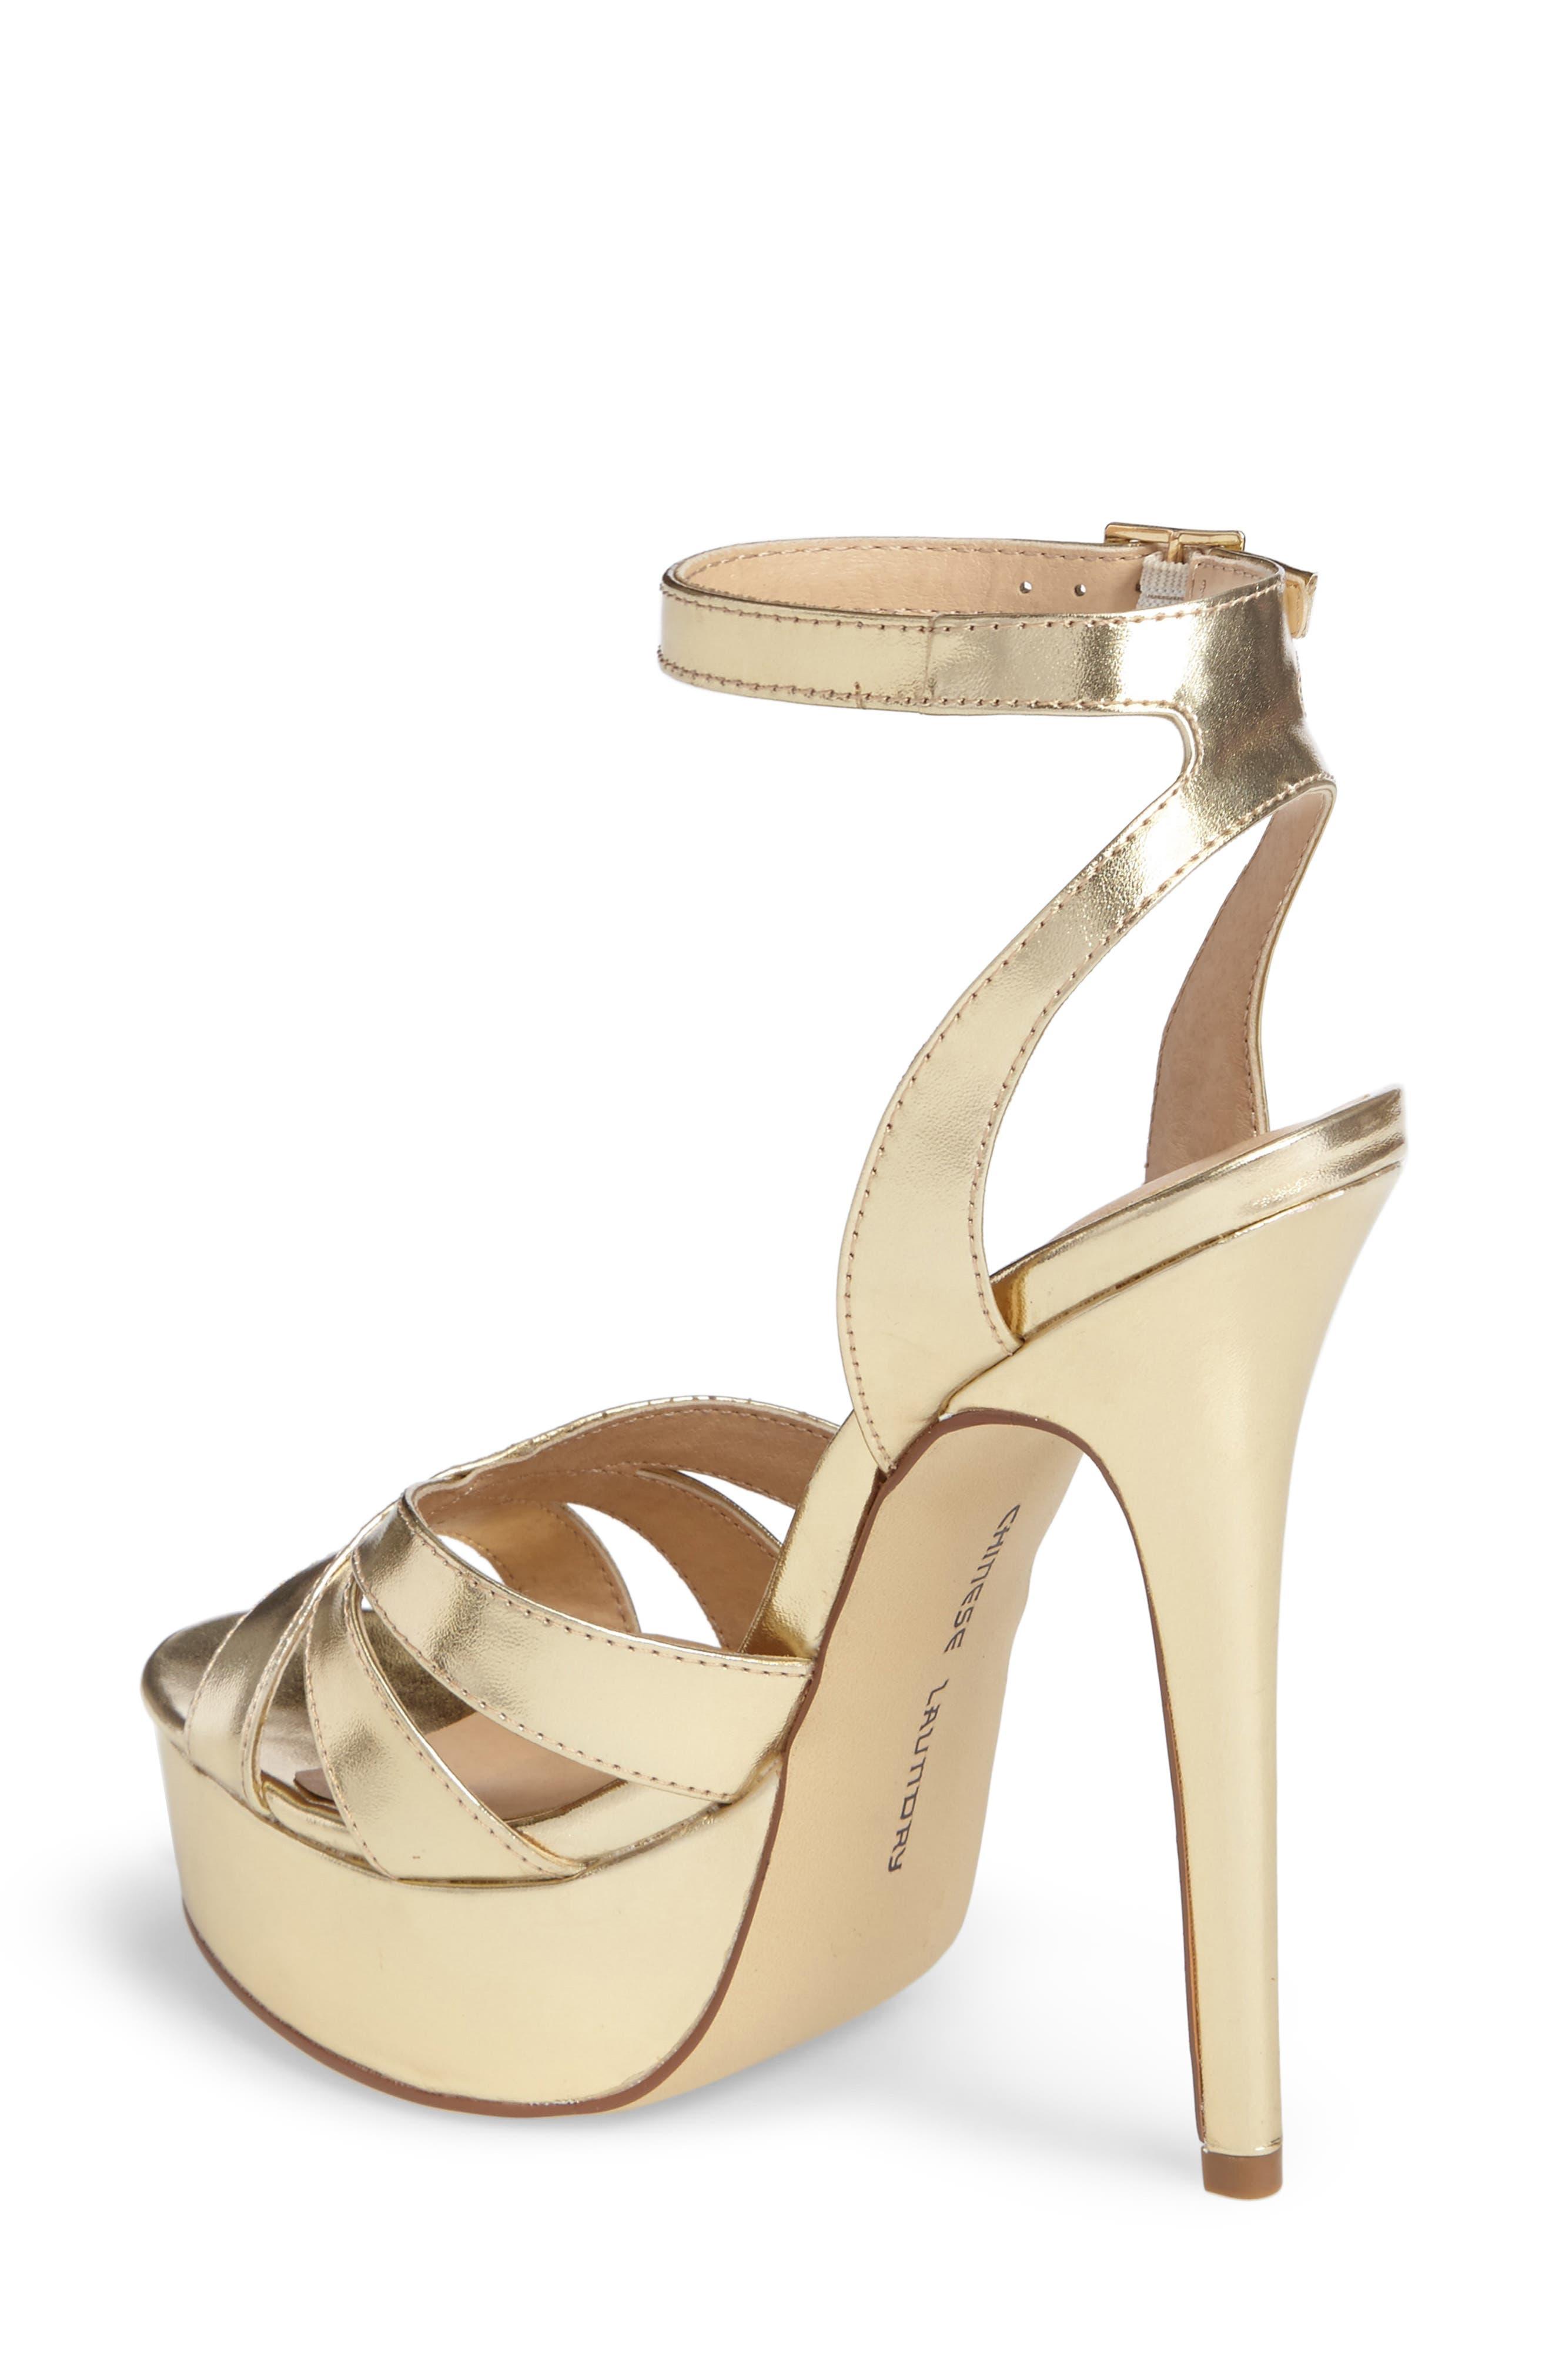 Alyssa Strappy Platform Sandal,                             Alternate thumbnail 4, color,